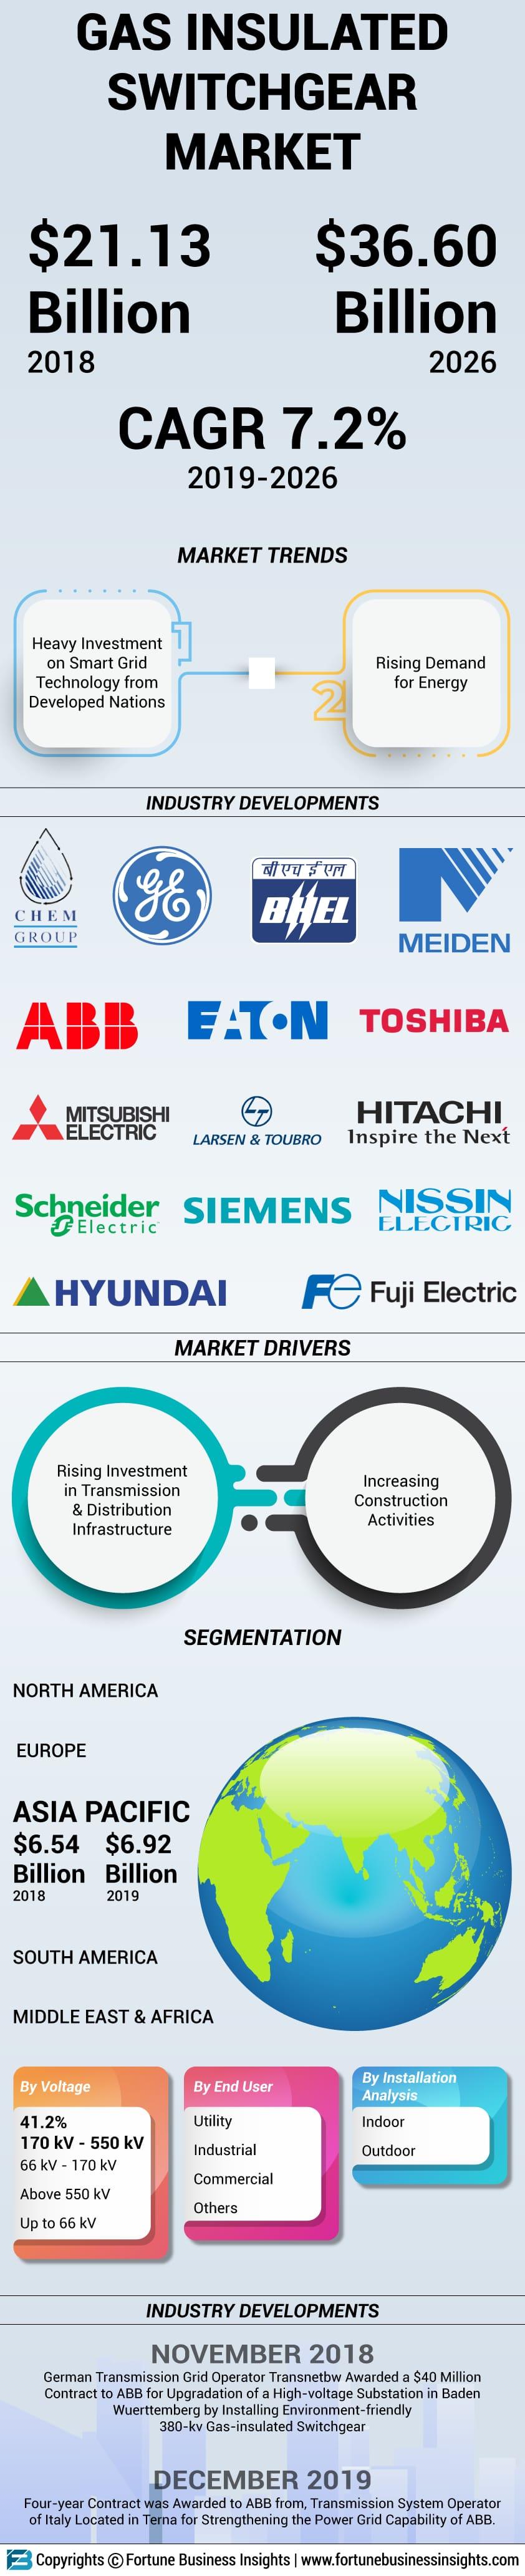 Gas Insulated Switchgear Market